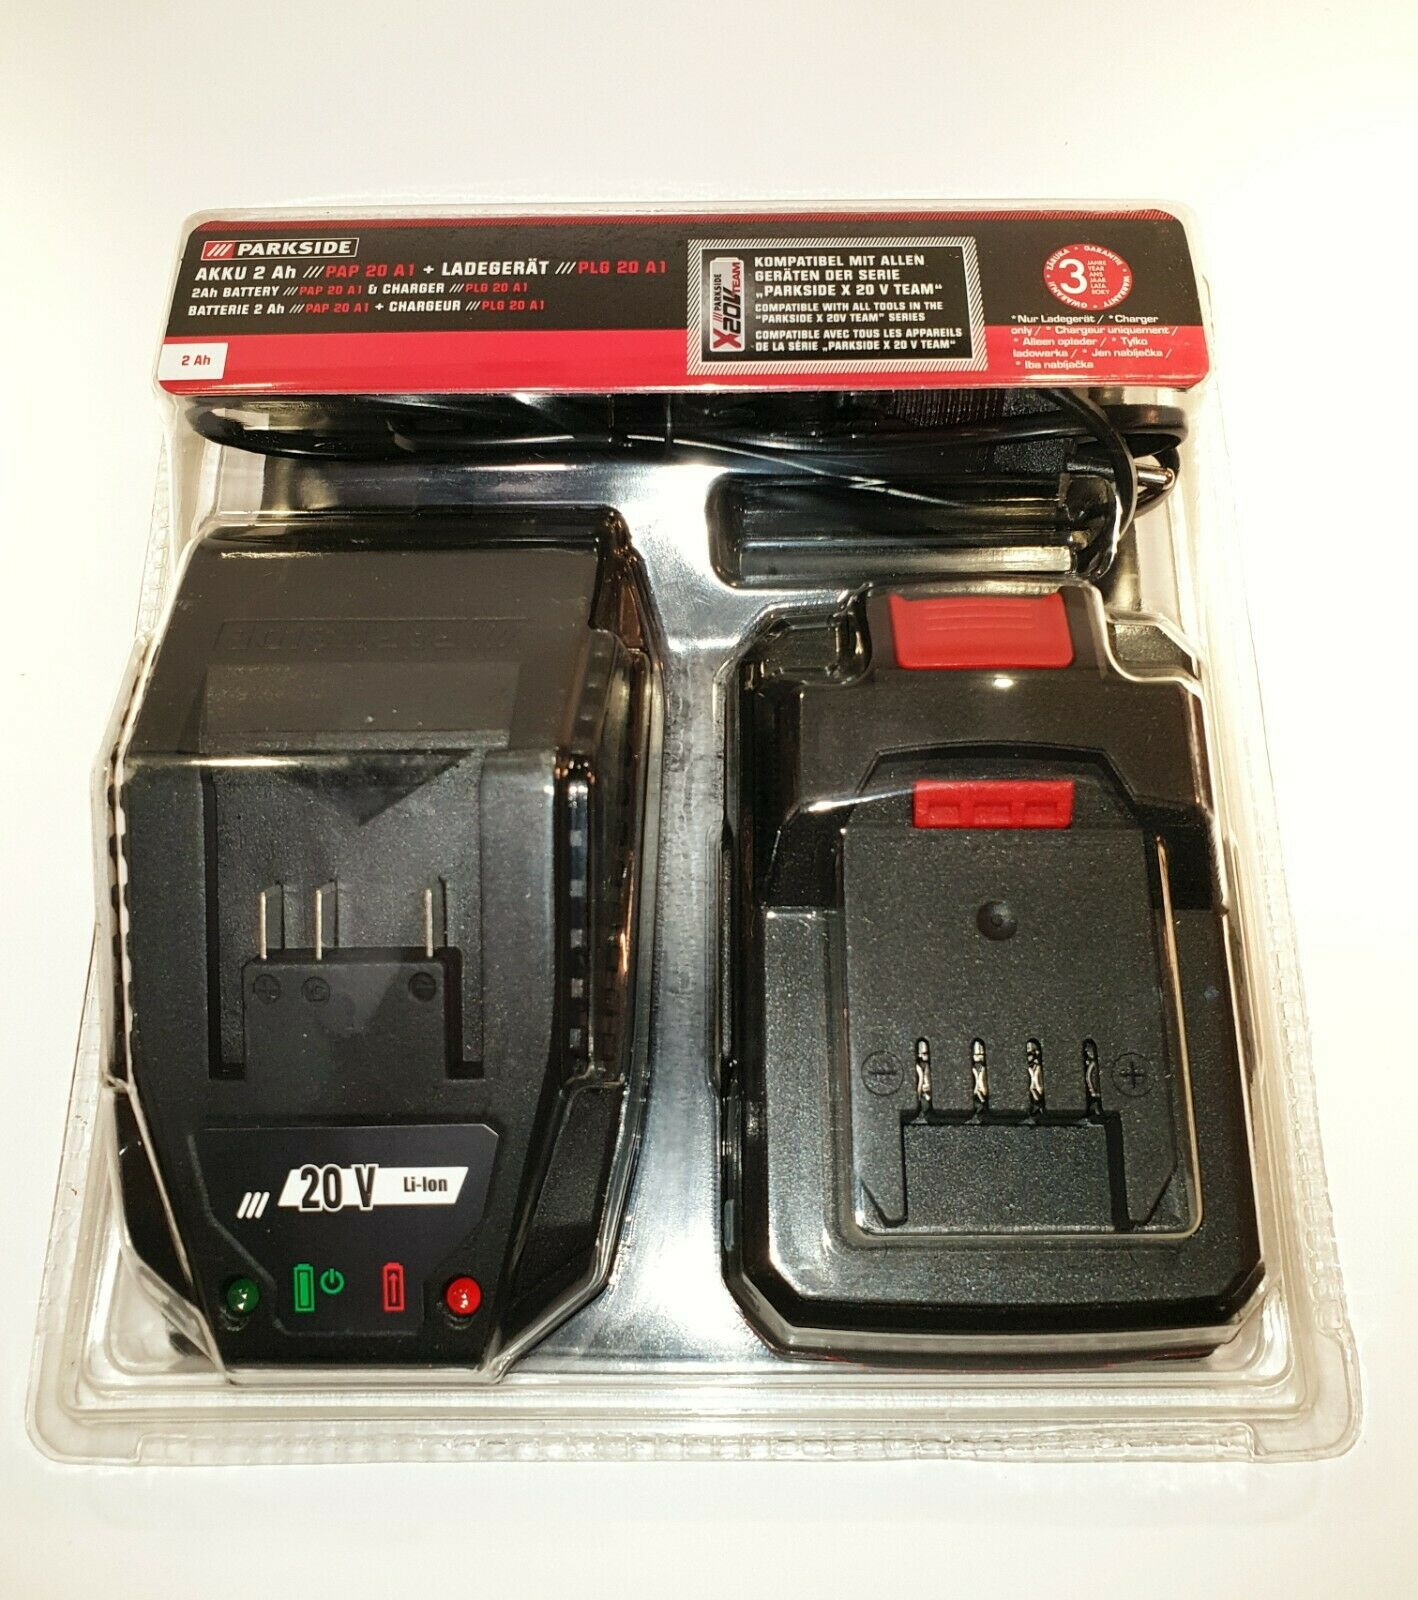 Parkside Doppel Schnell Batterieladegerät Pdslg 20 A1 Kompatibel W Zubehör X